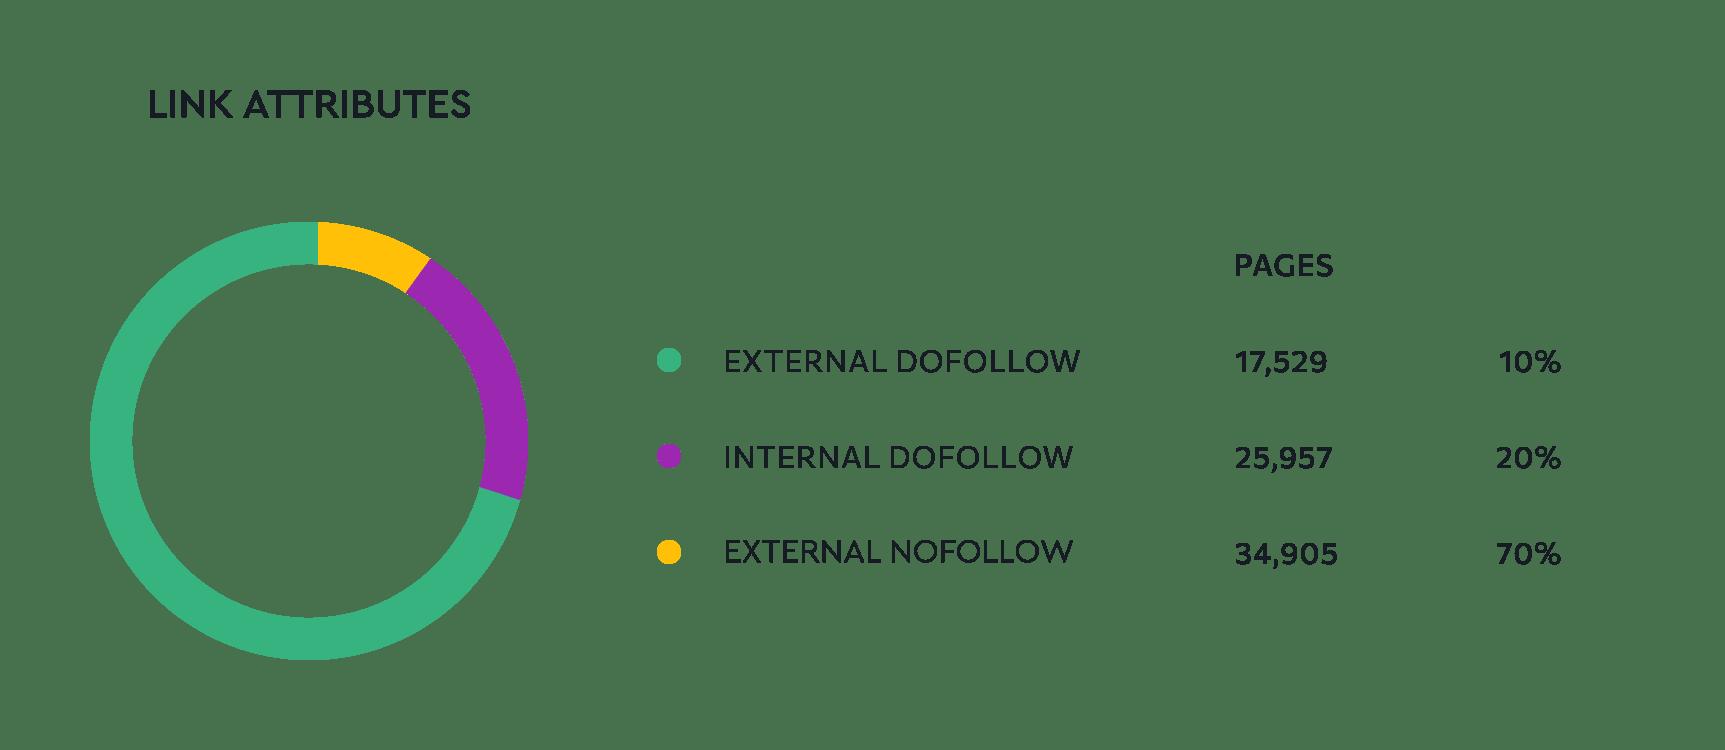 Link attributes distribution